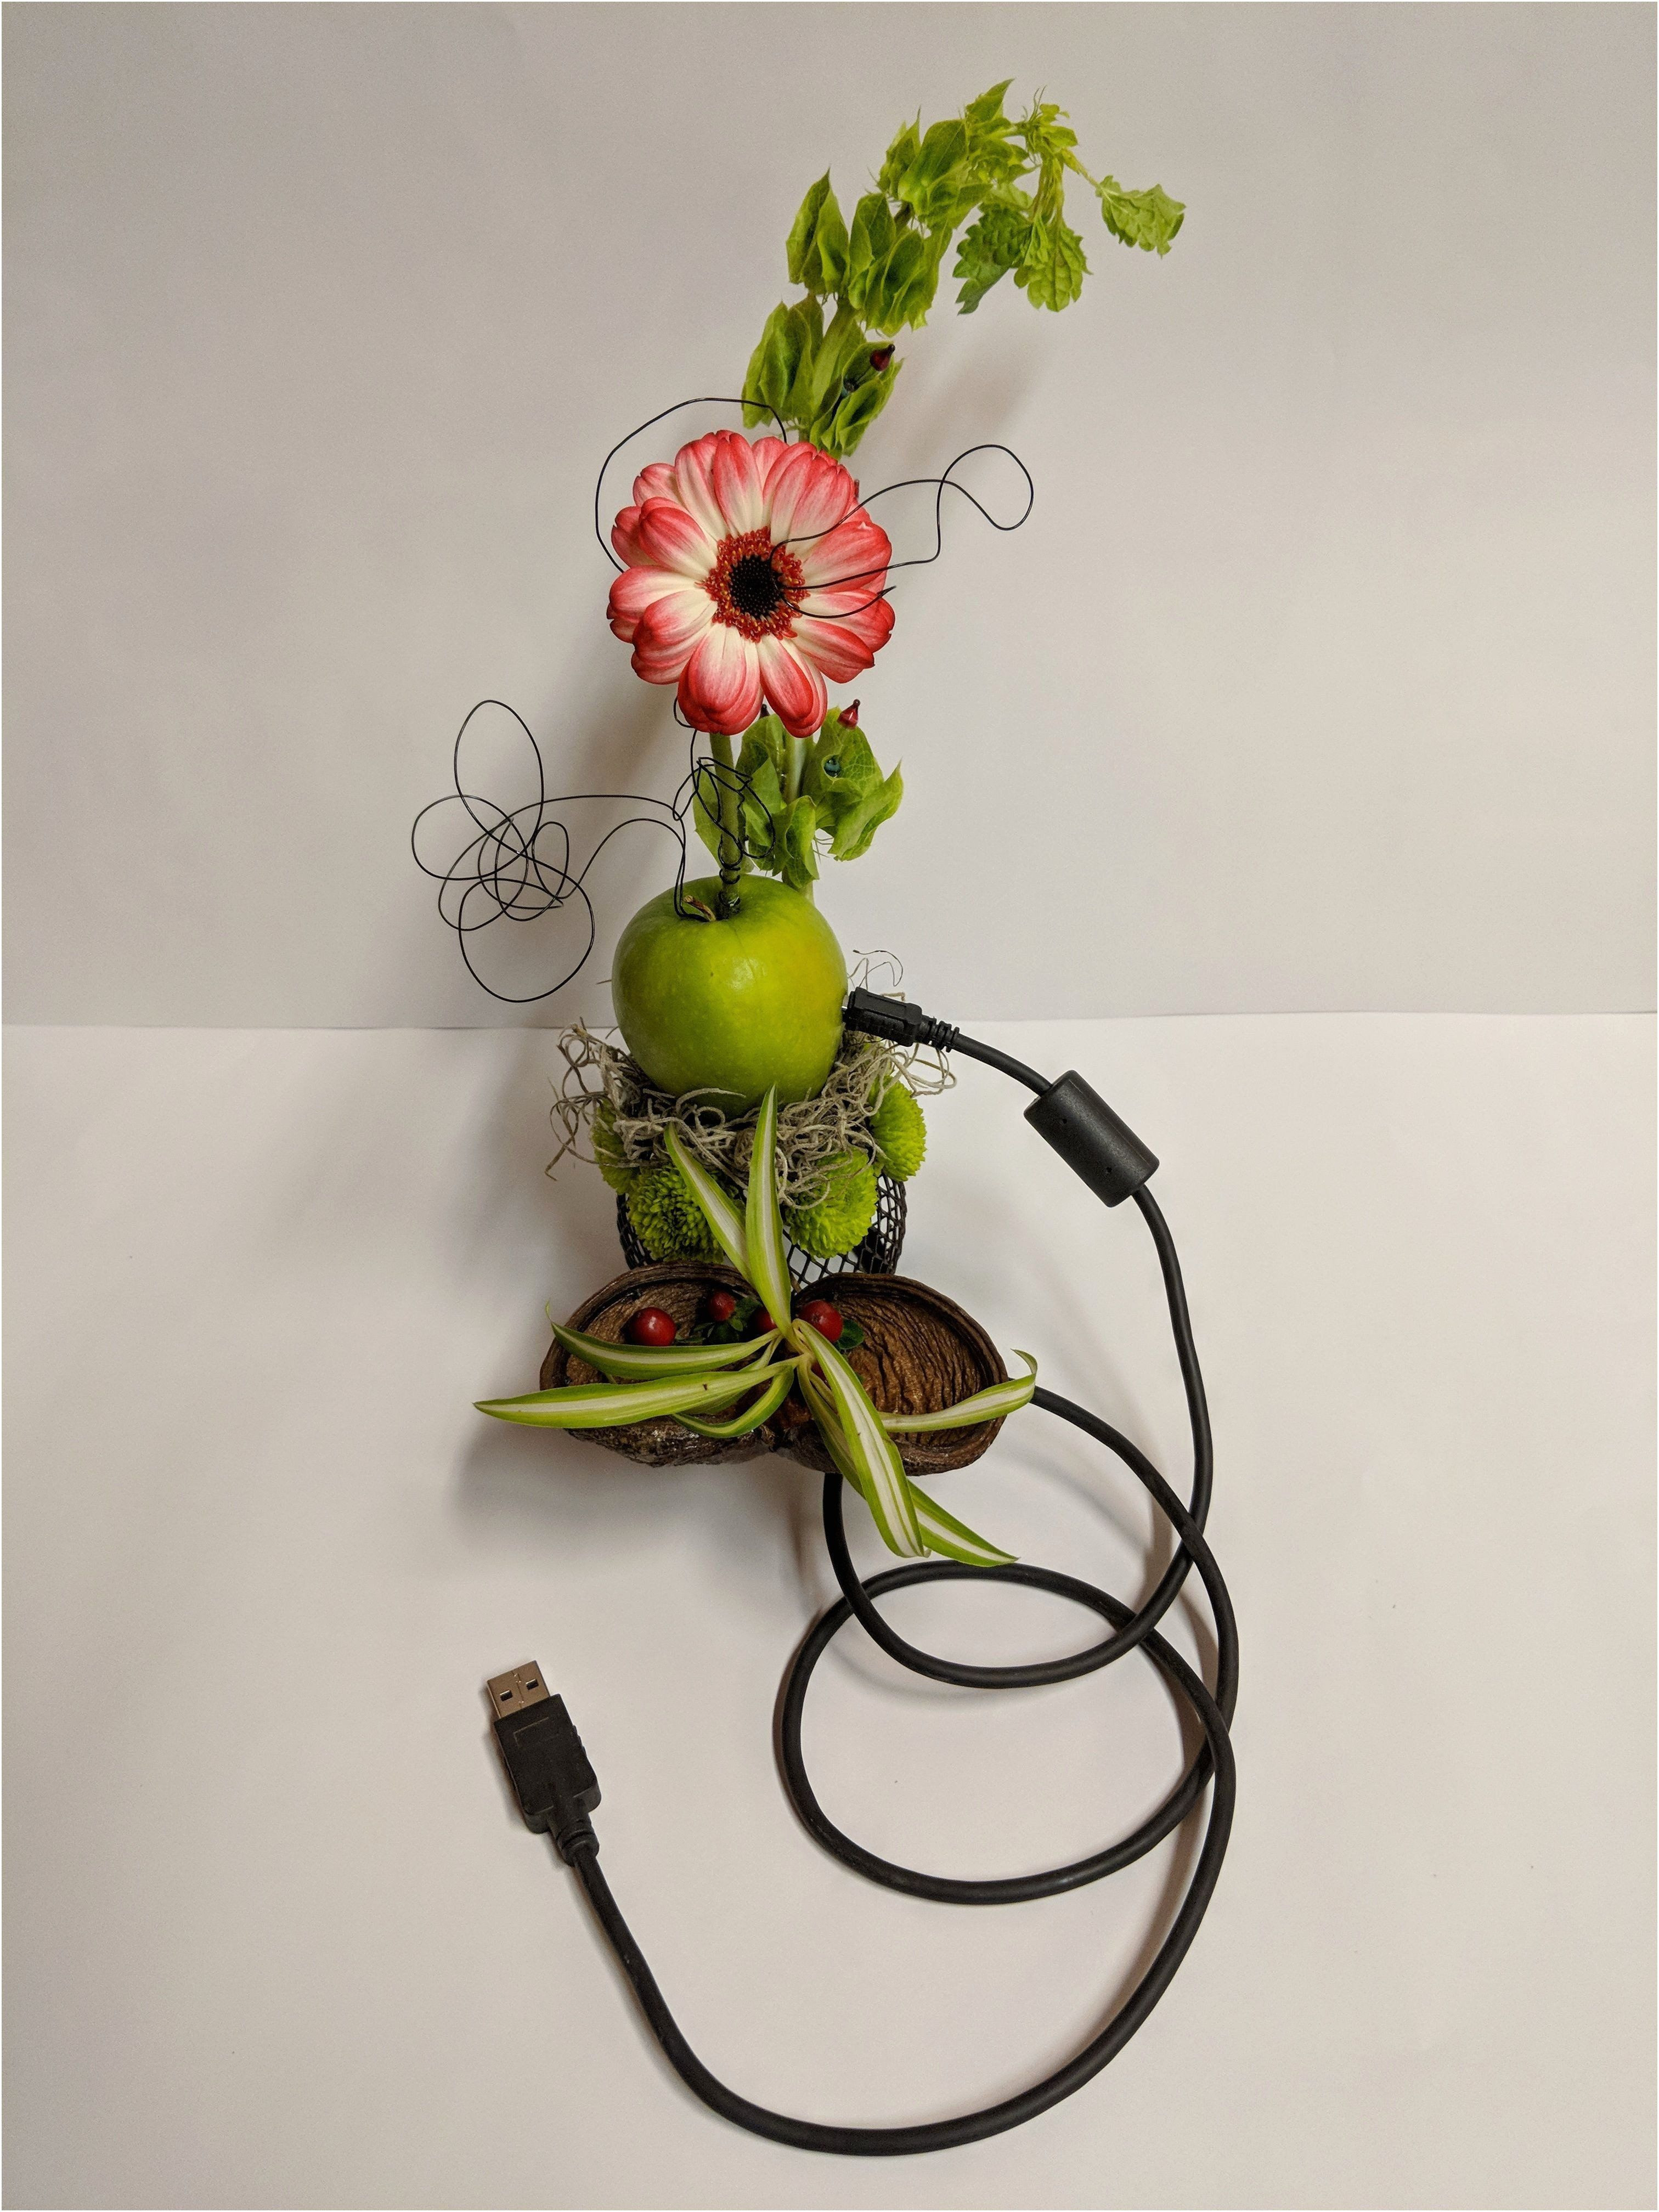 12 Attractive Cemetery Flower Vases Wholesale Decorative Vase Ideas